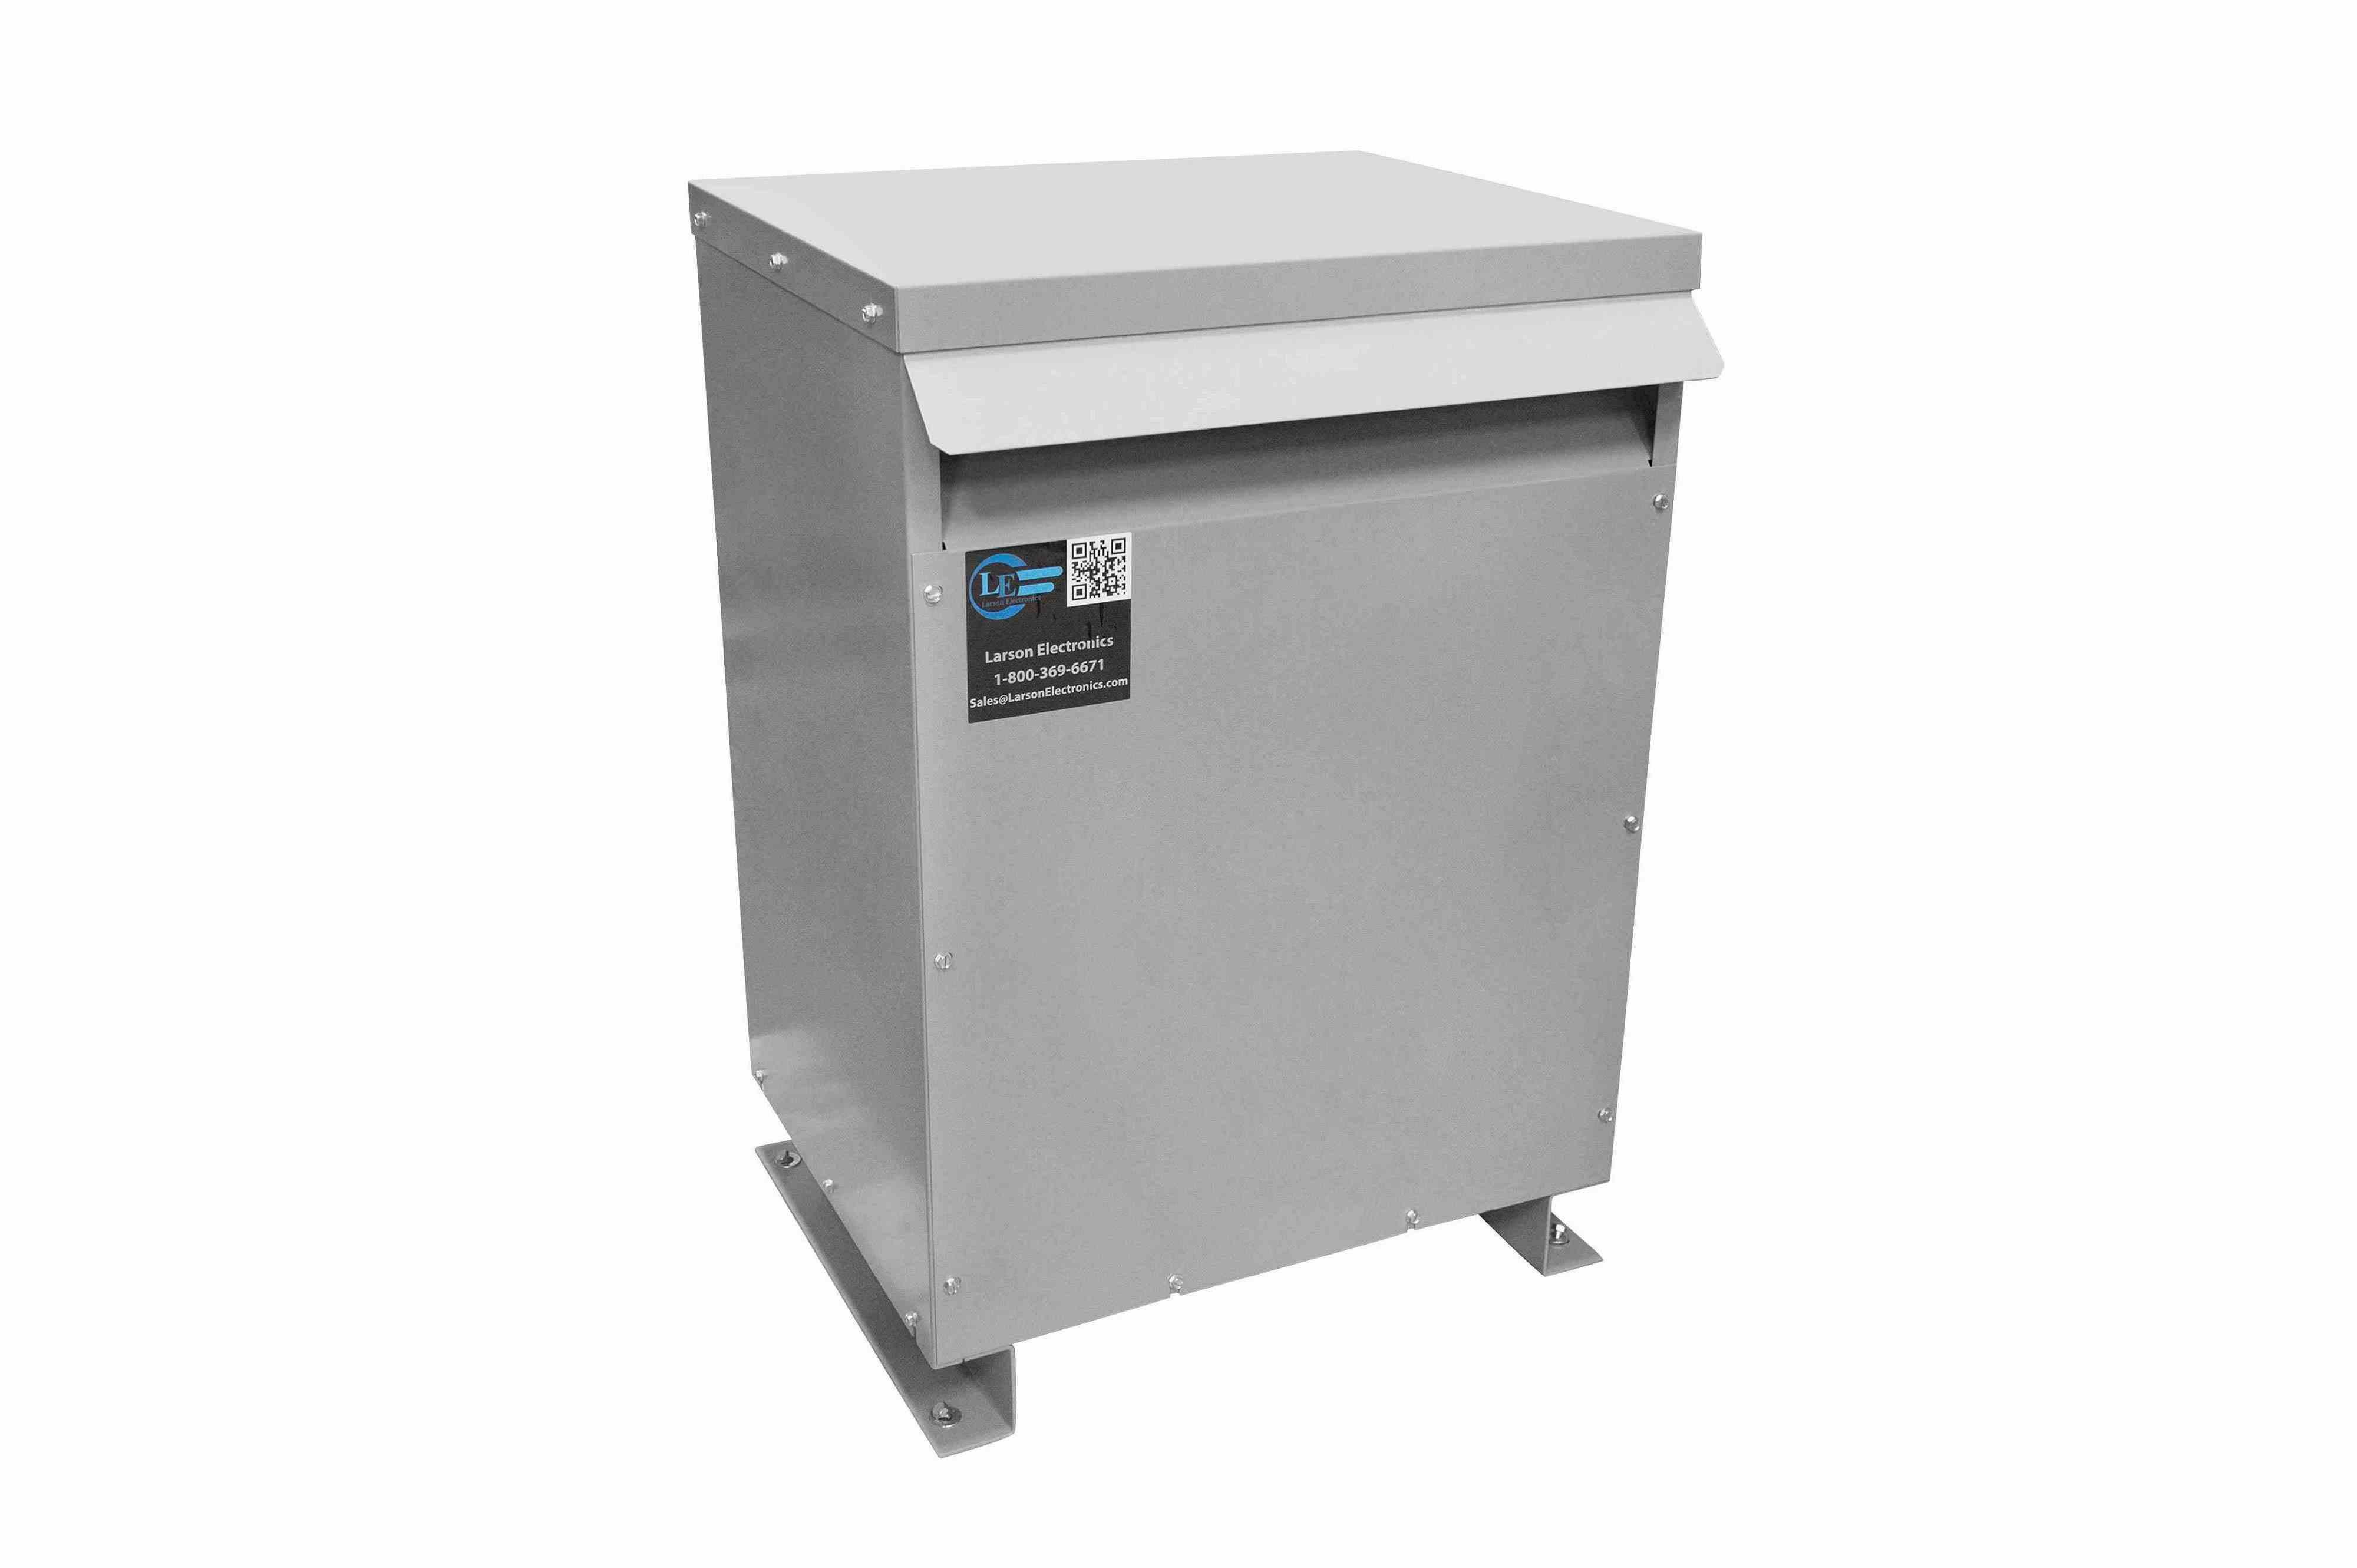 200 kVA 3PH DOE Transformer, 415V Delta Primary, 480Y/277 Wye-N Secondary, N3R, Ventilated, 50 Hz